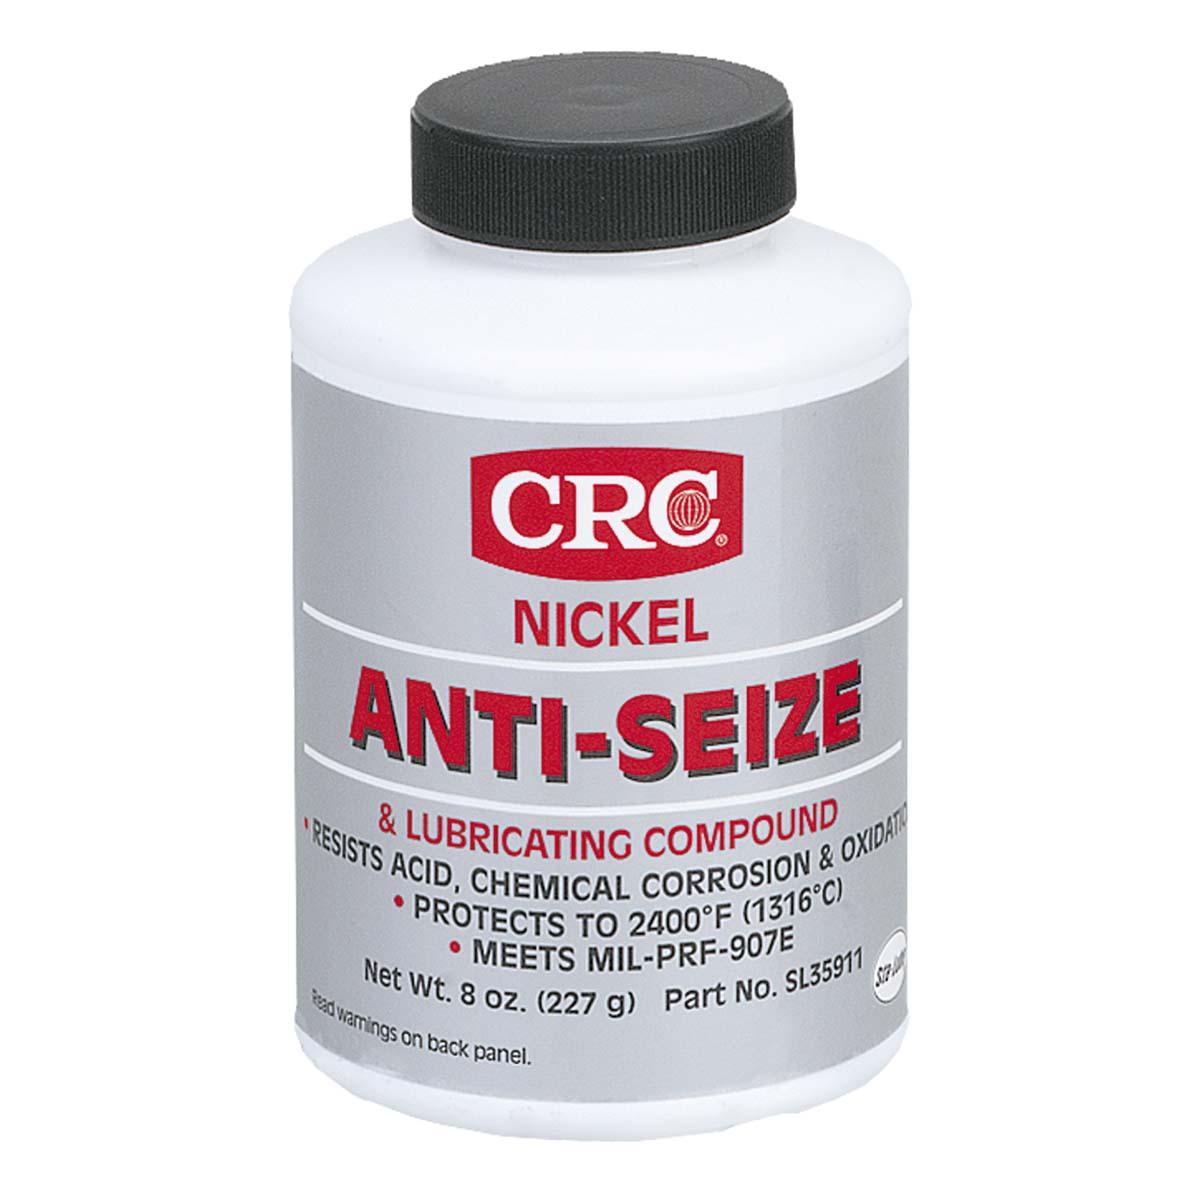 Nickel Anti-Seize Lubricating Compound, 8 Wt Oz